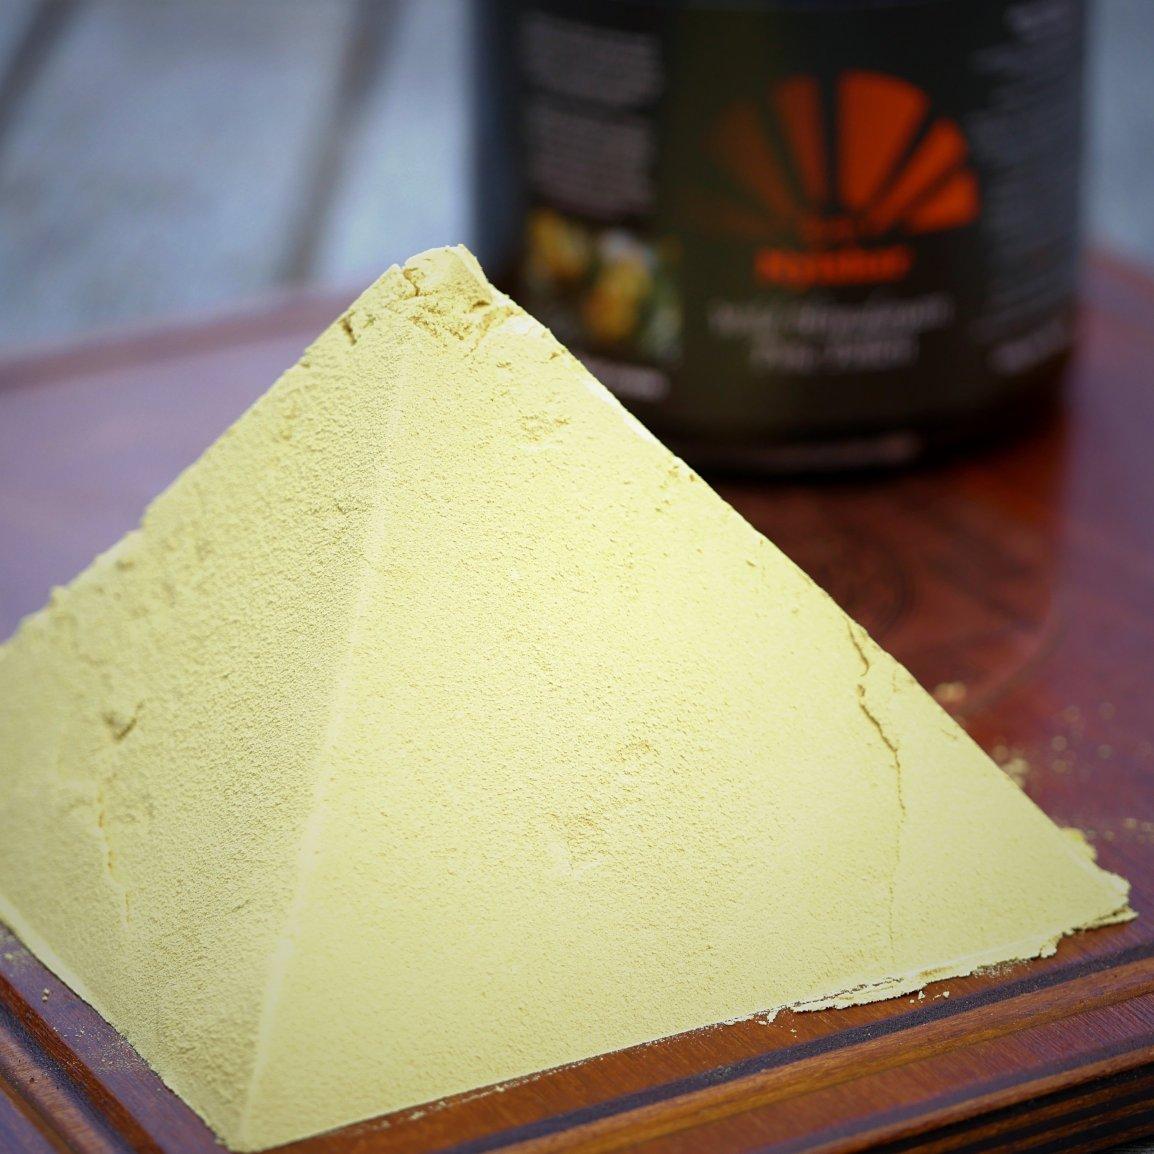 Wild Himalayan Pine Pollen Powder - 100g 00014